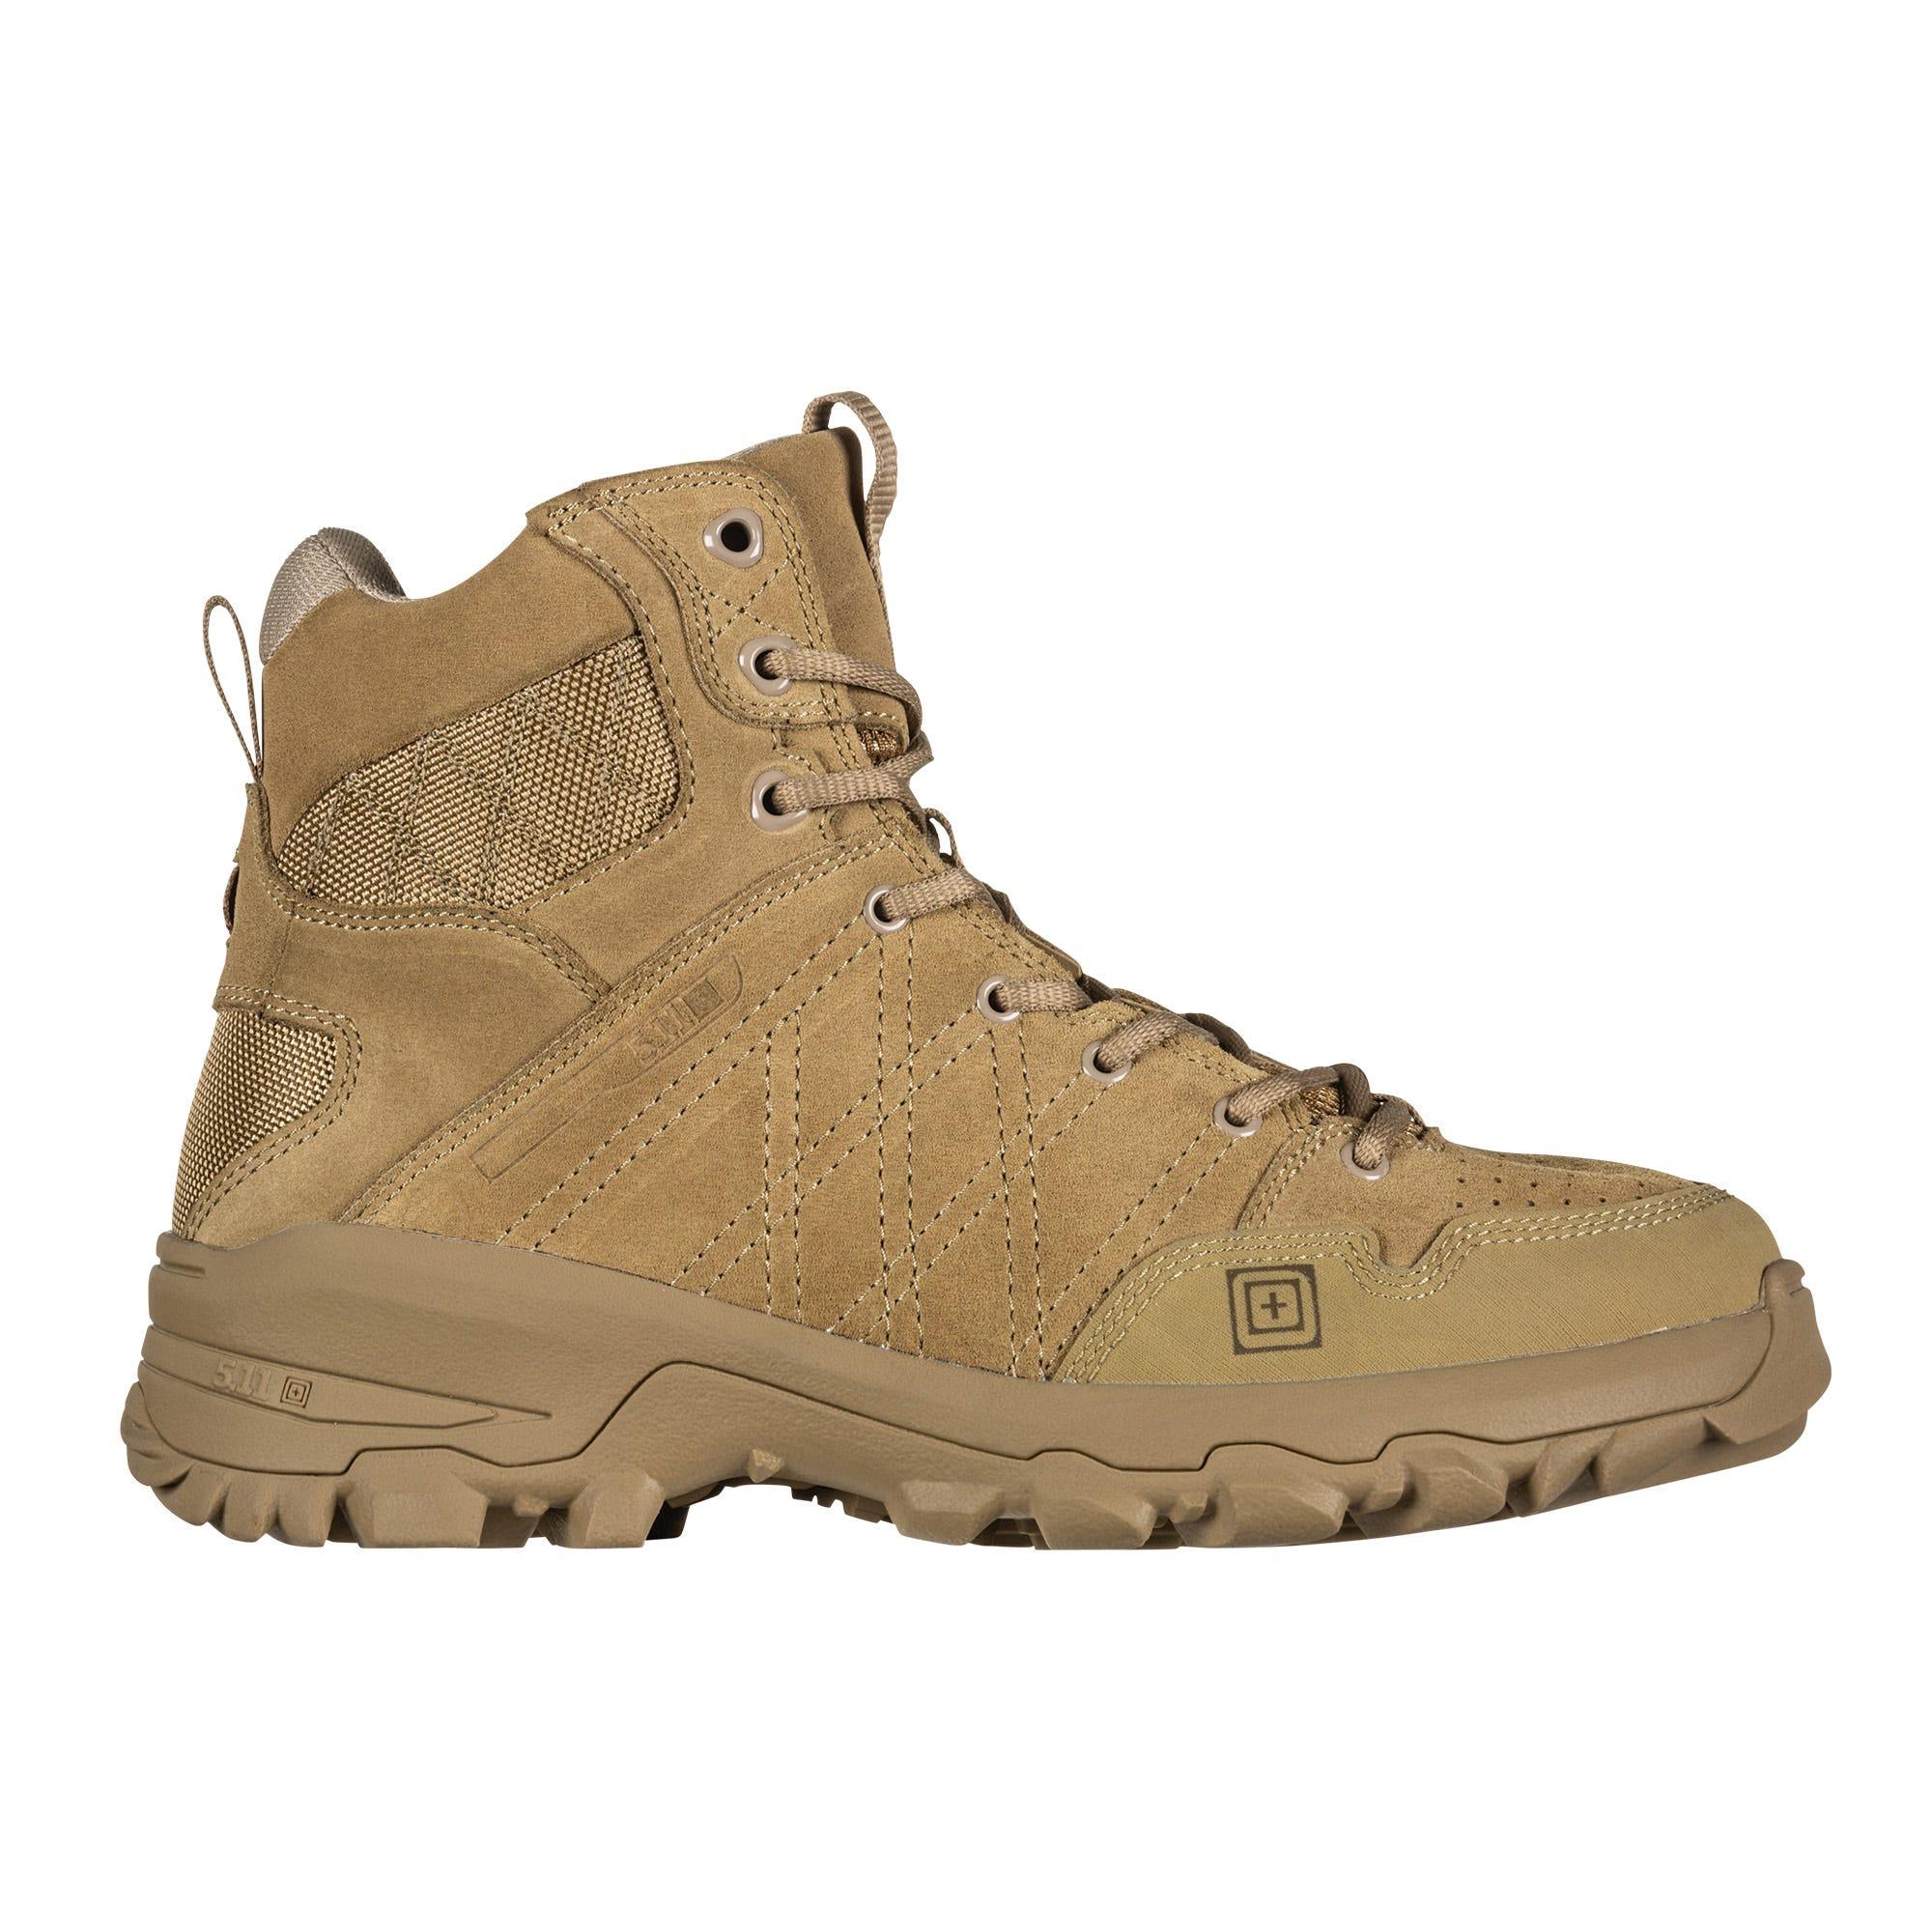 5.11 Tactical Men's Cable Hiker Tactical Boot (Coyote) thumbnail